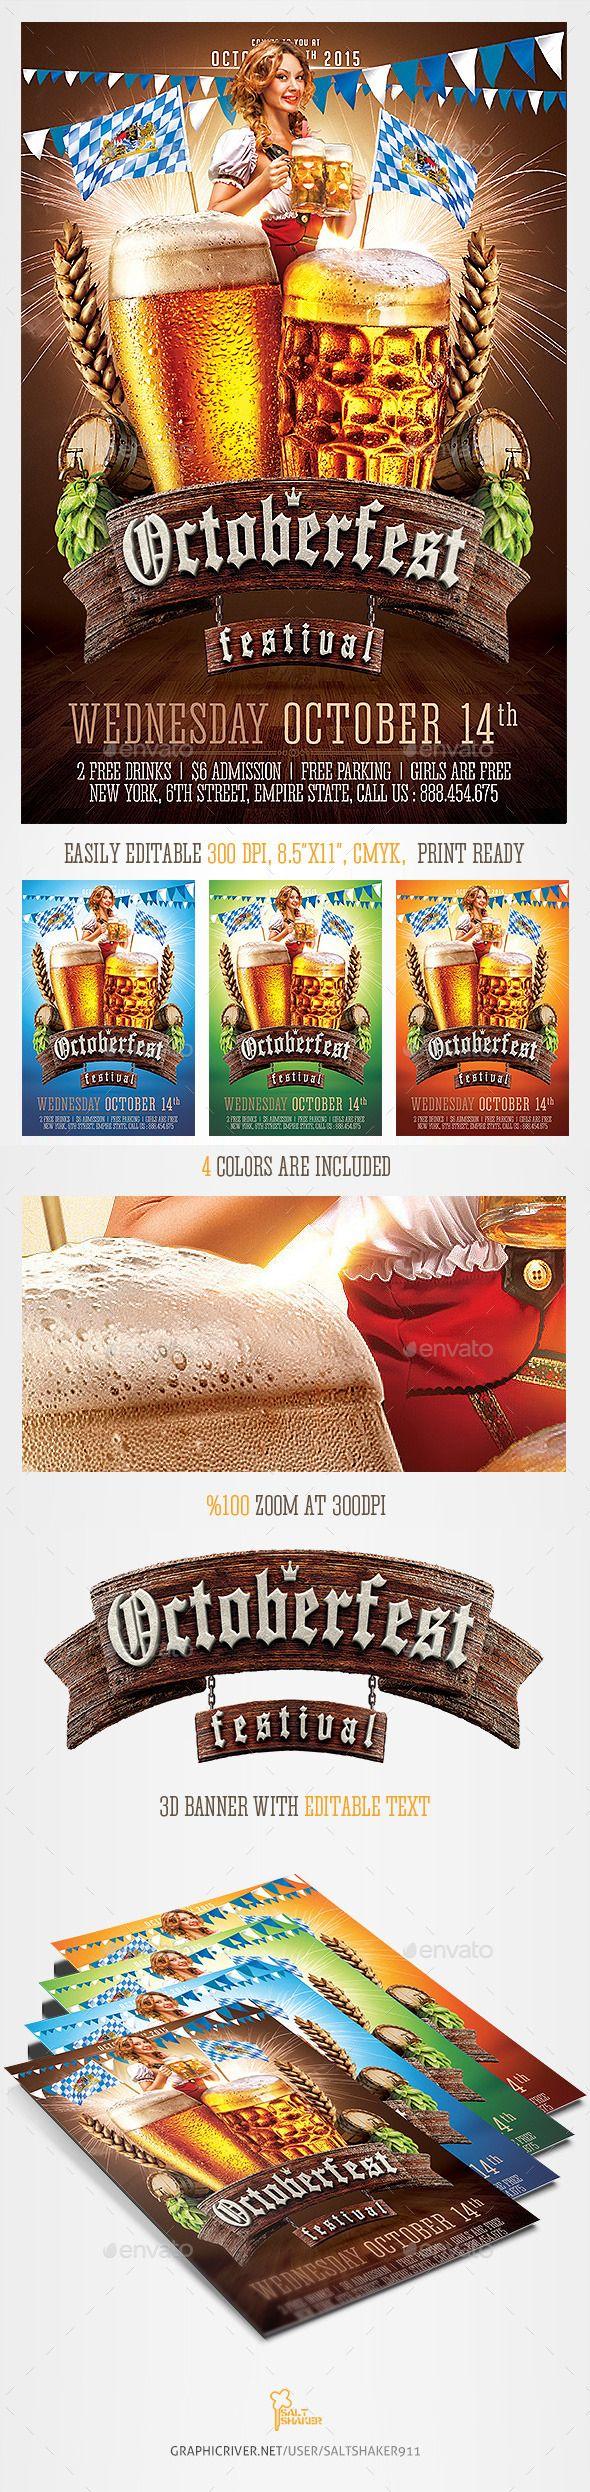 Oktoberfest Beer Festival Flyer Template #design Download: http://graphicriver.net/item/oktoberfest-beer-festival-flyer-template/12678145?ref=ksioks